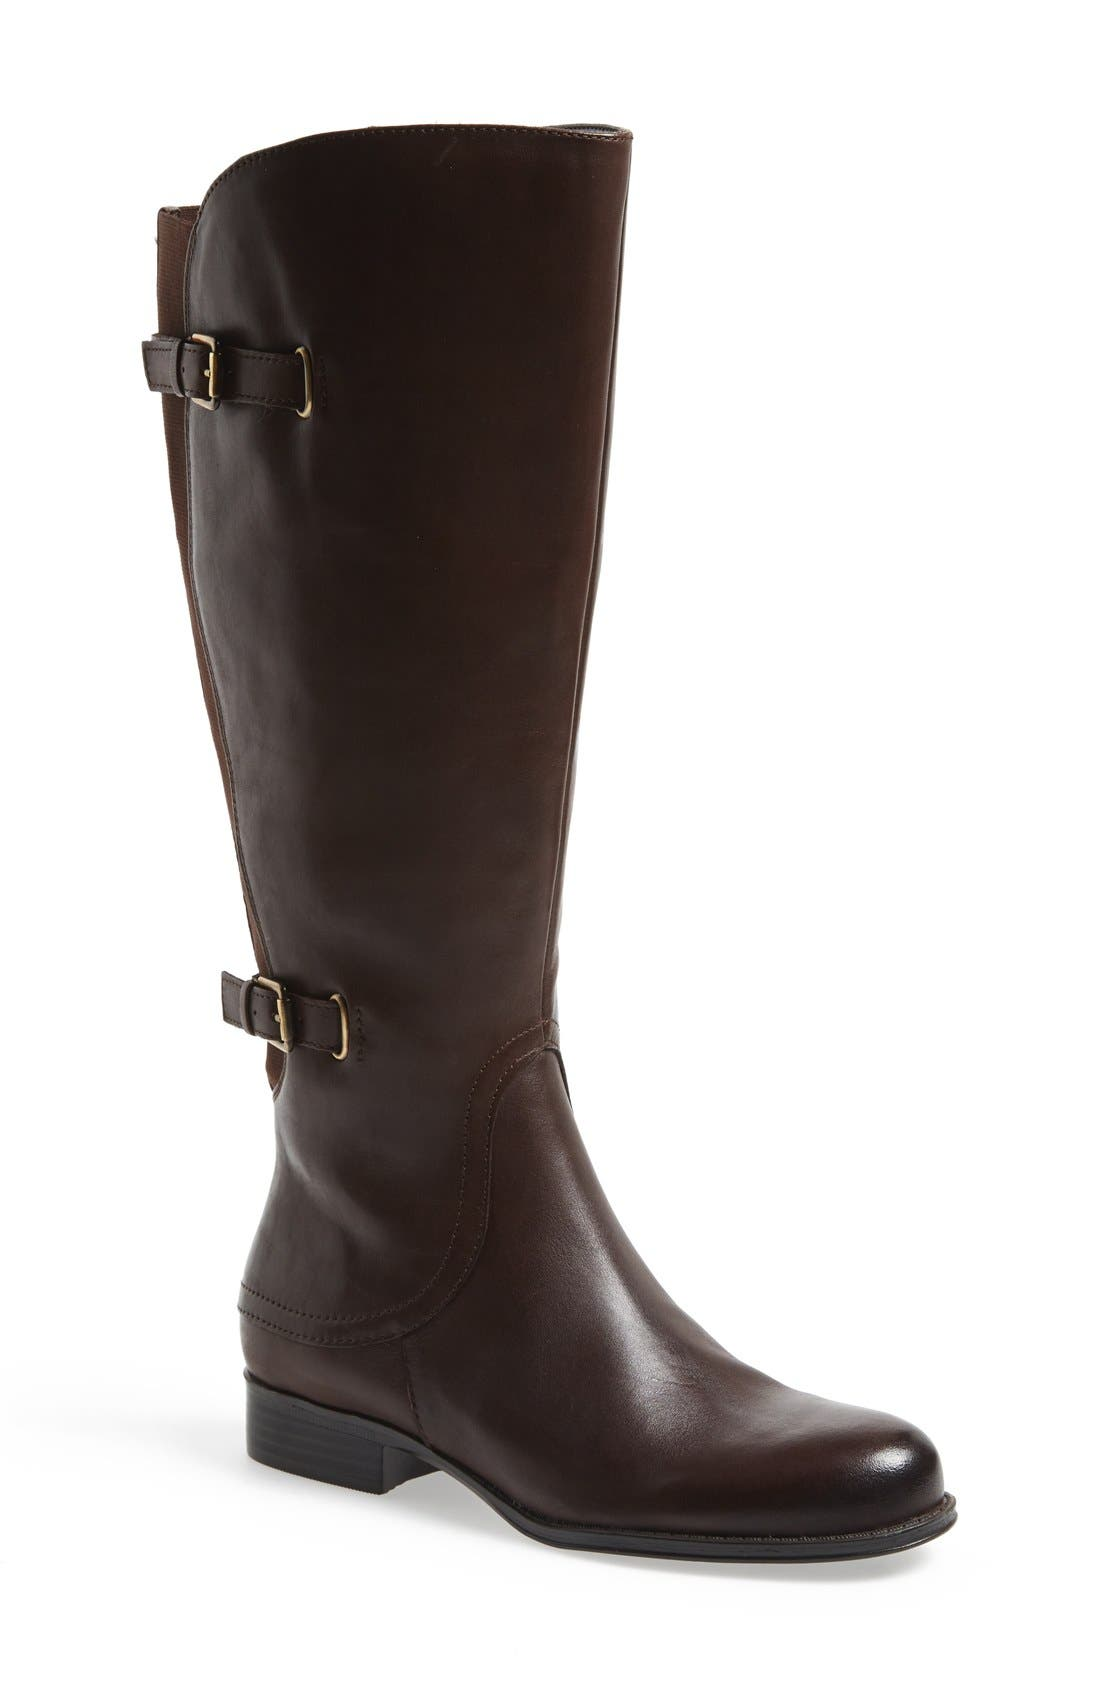 Main Image - Naturalizer 'Jamison' Tall Boot (Wide Calf) (Women)